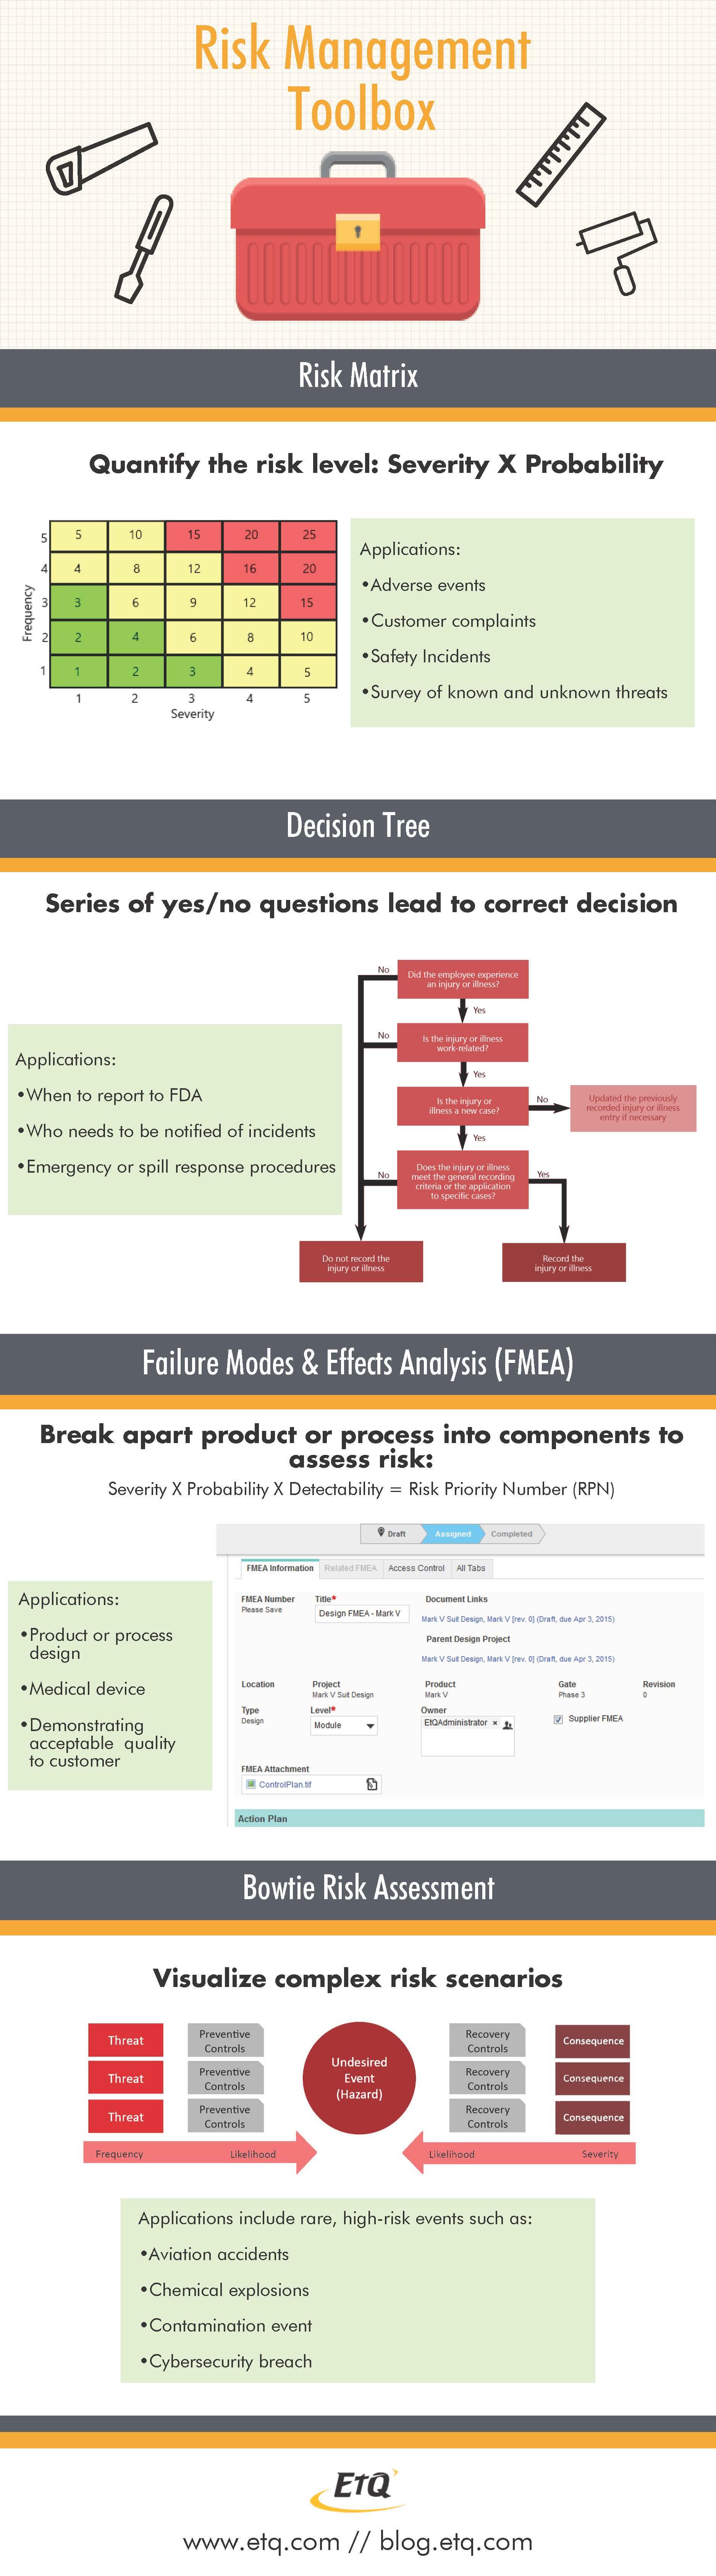 Risk Management Toolbox